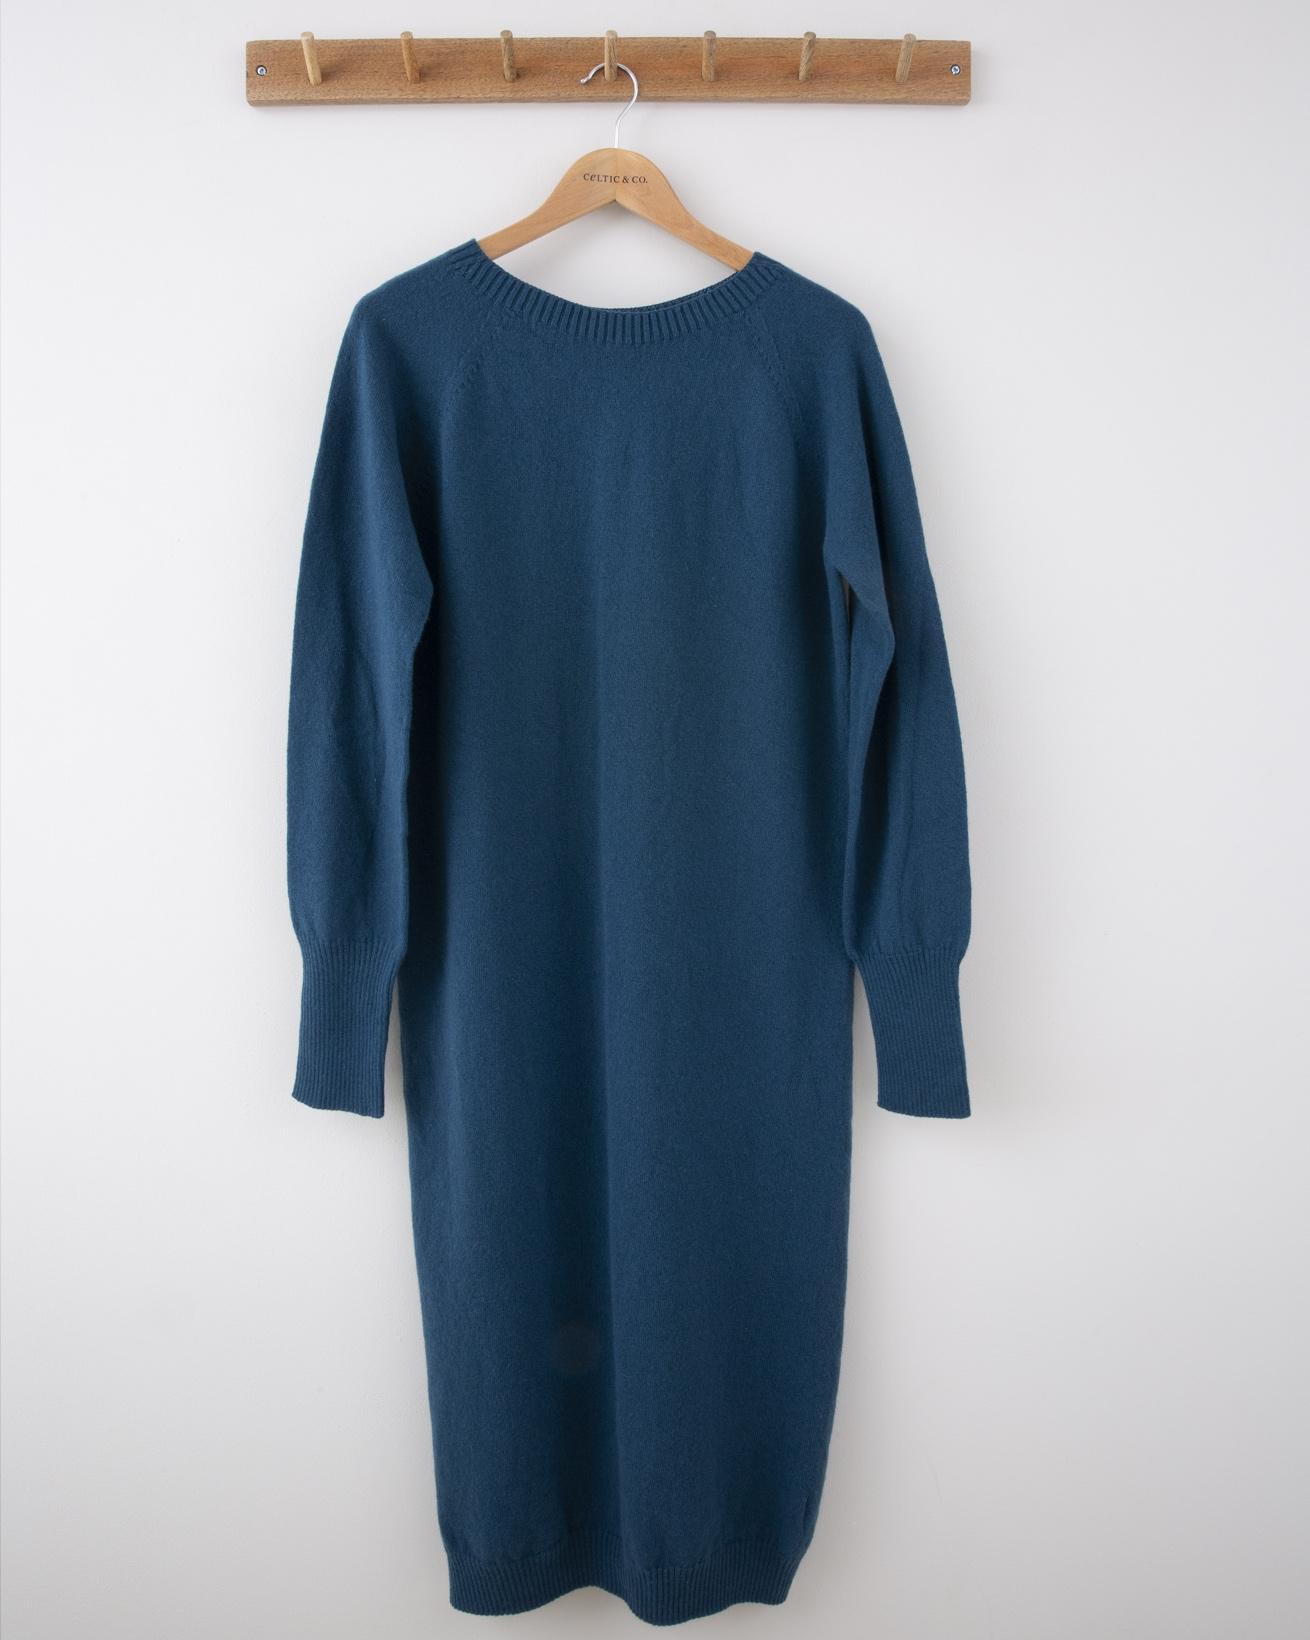 Supersoft Midi Dress - Small - Icelandic Blue - 1271